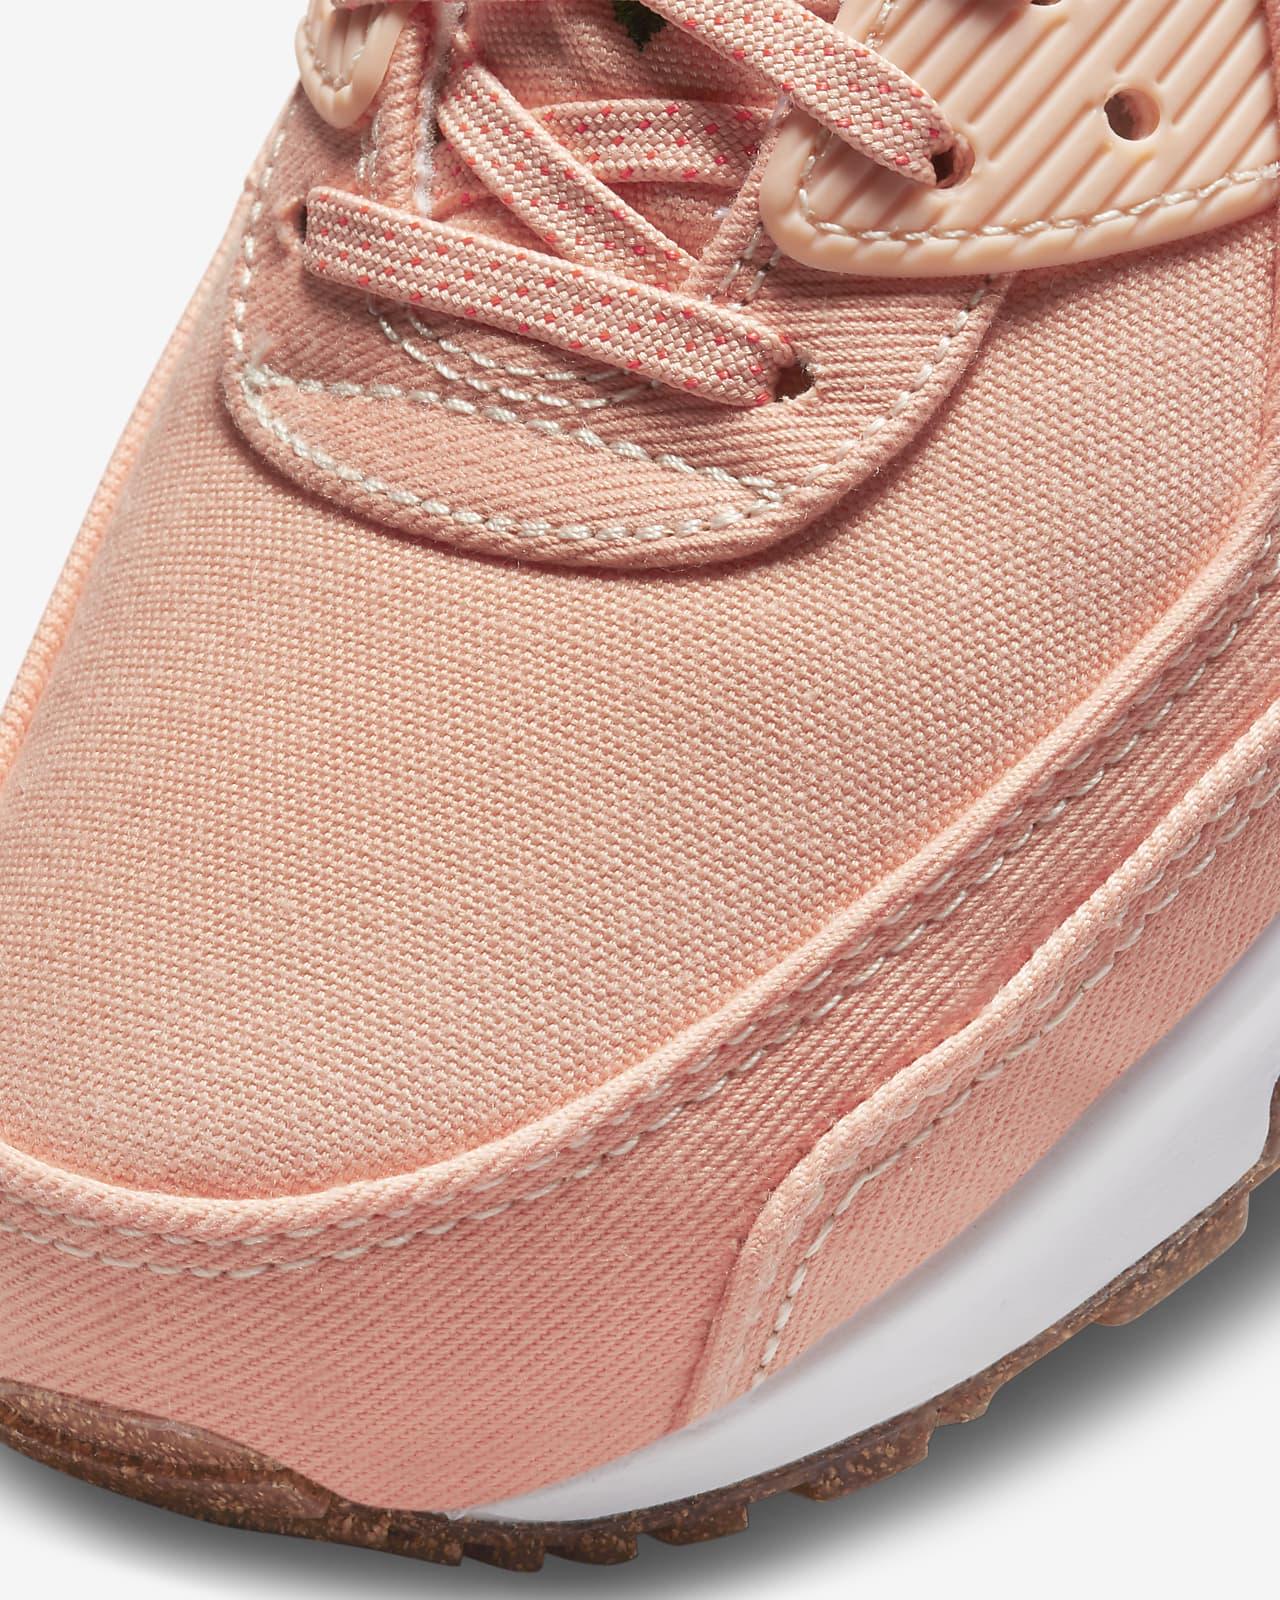 Nike Air Max 90 SE Women's Shoes. Nike ID